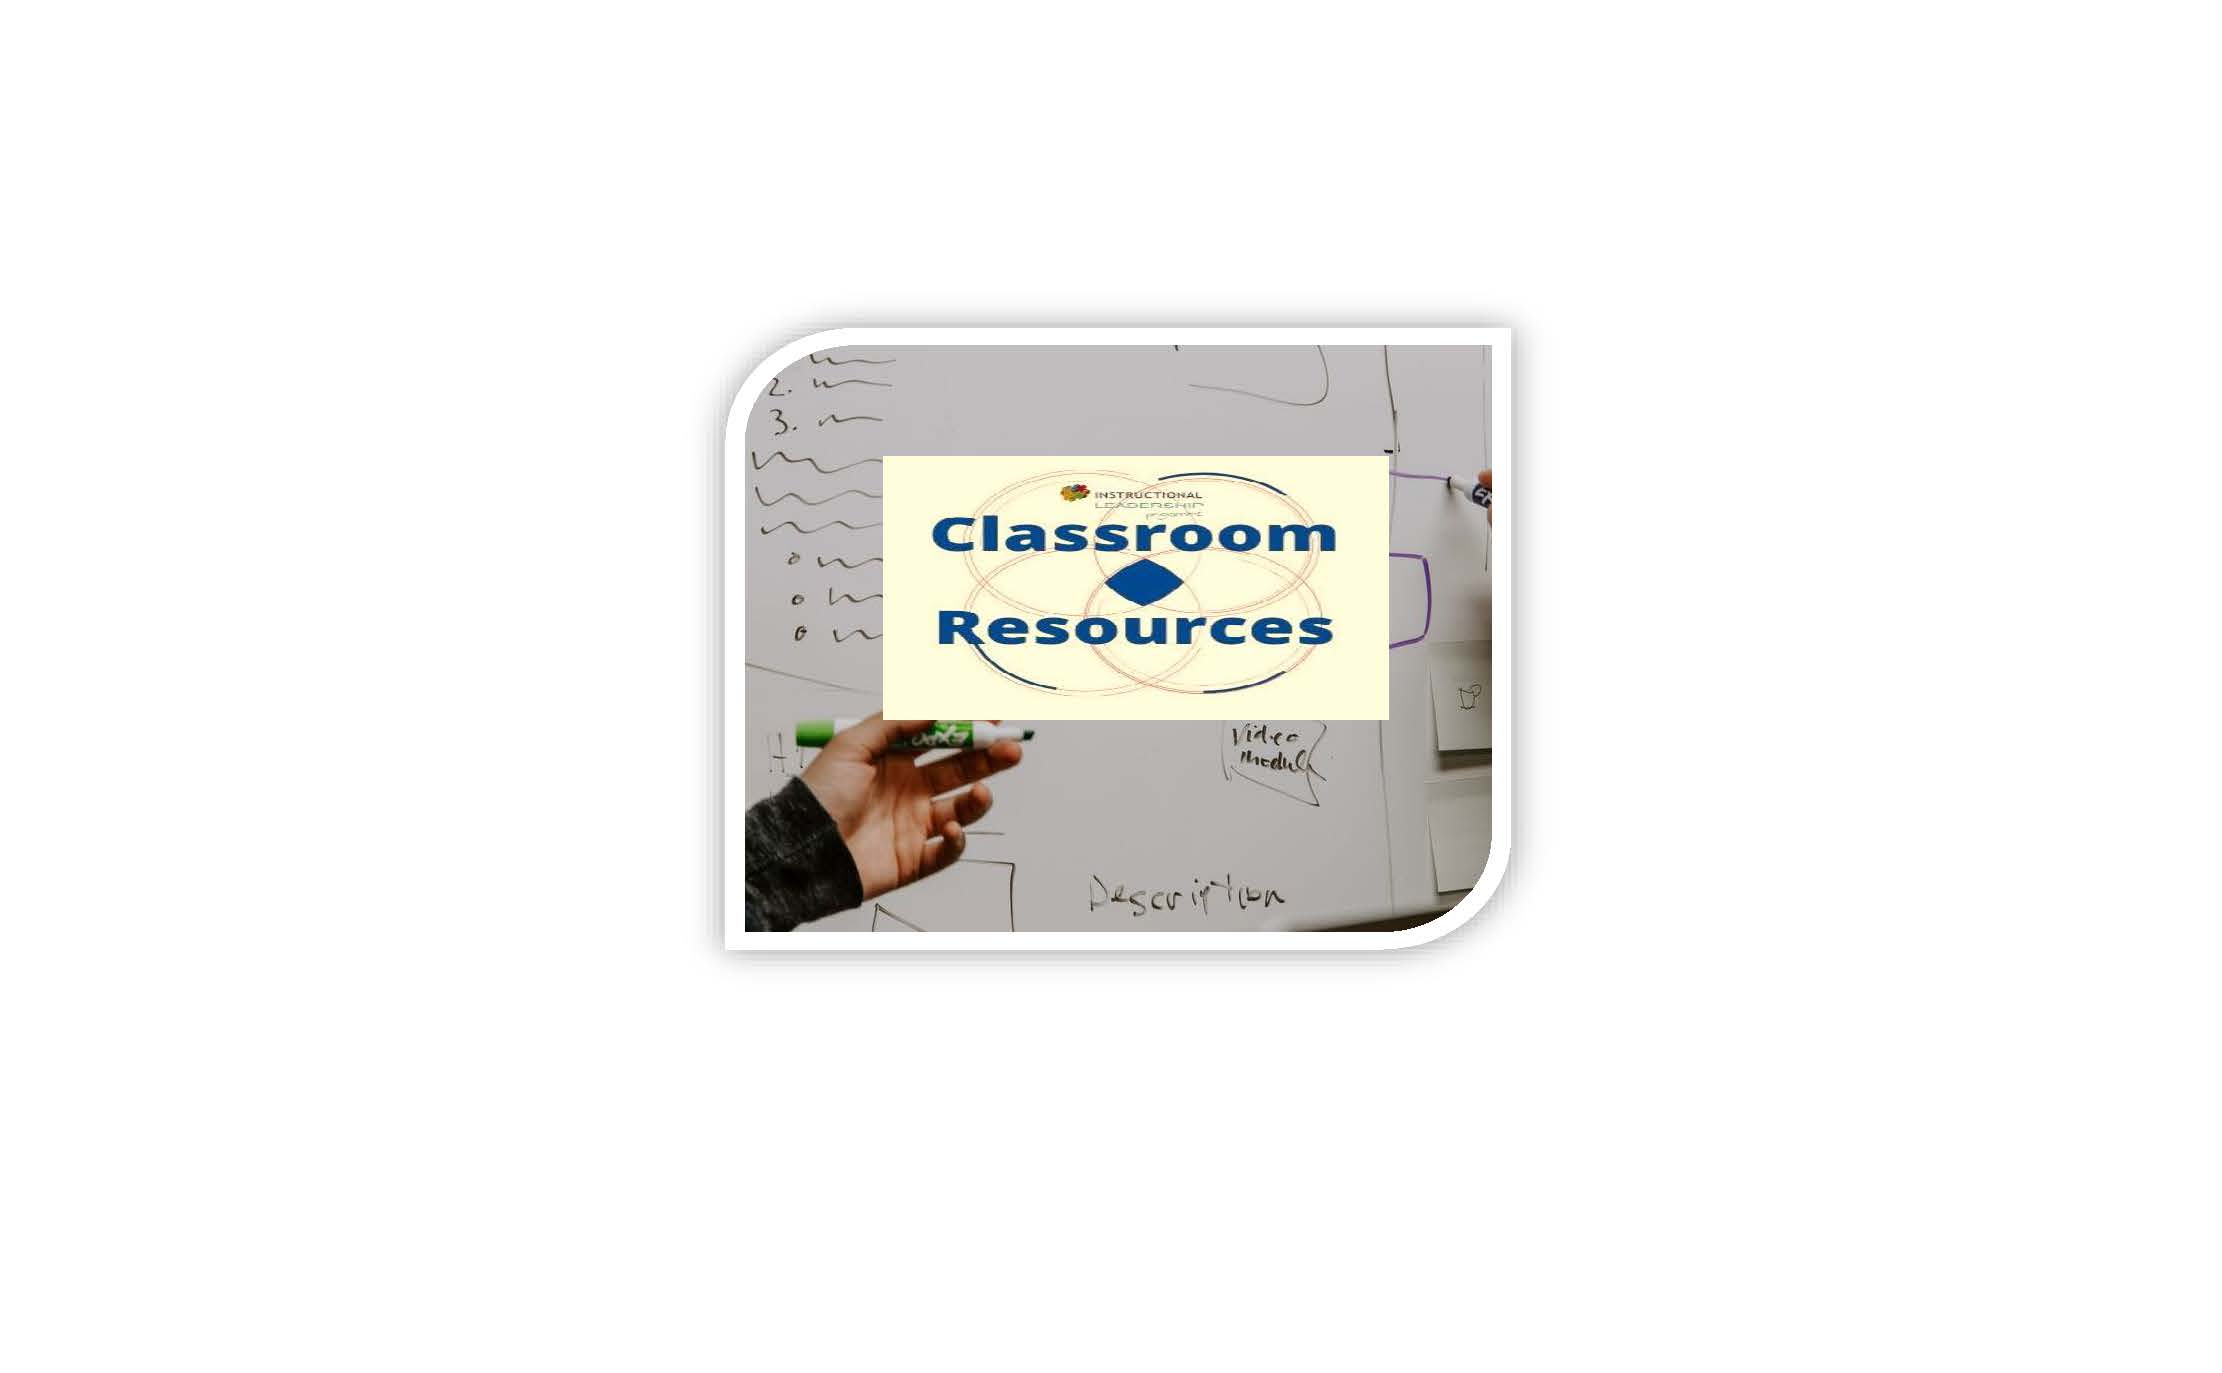 Classroom Resources – Classroom